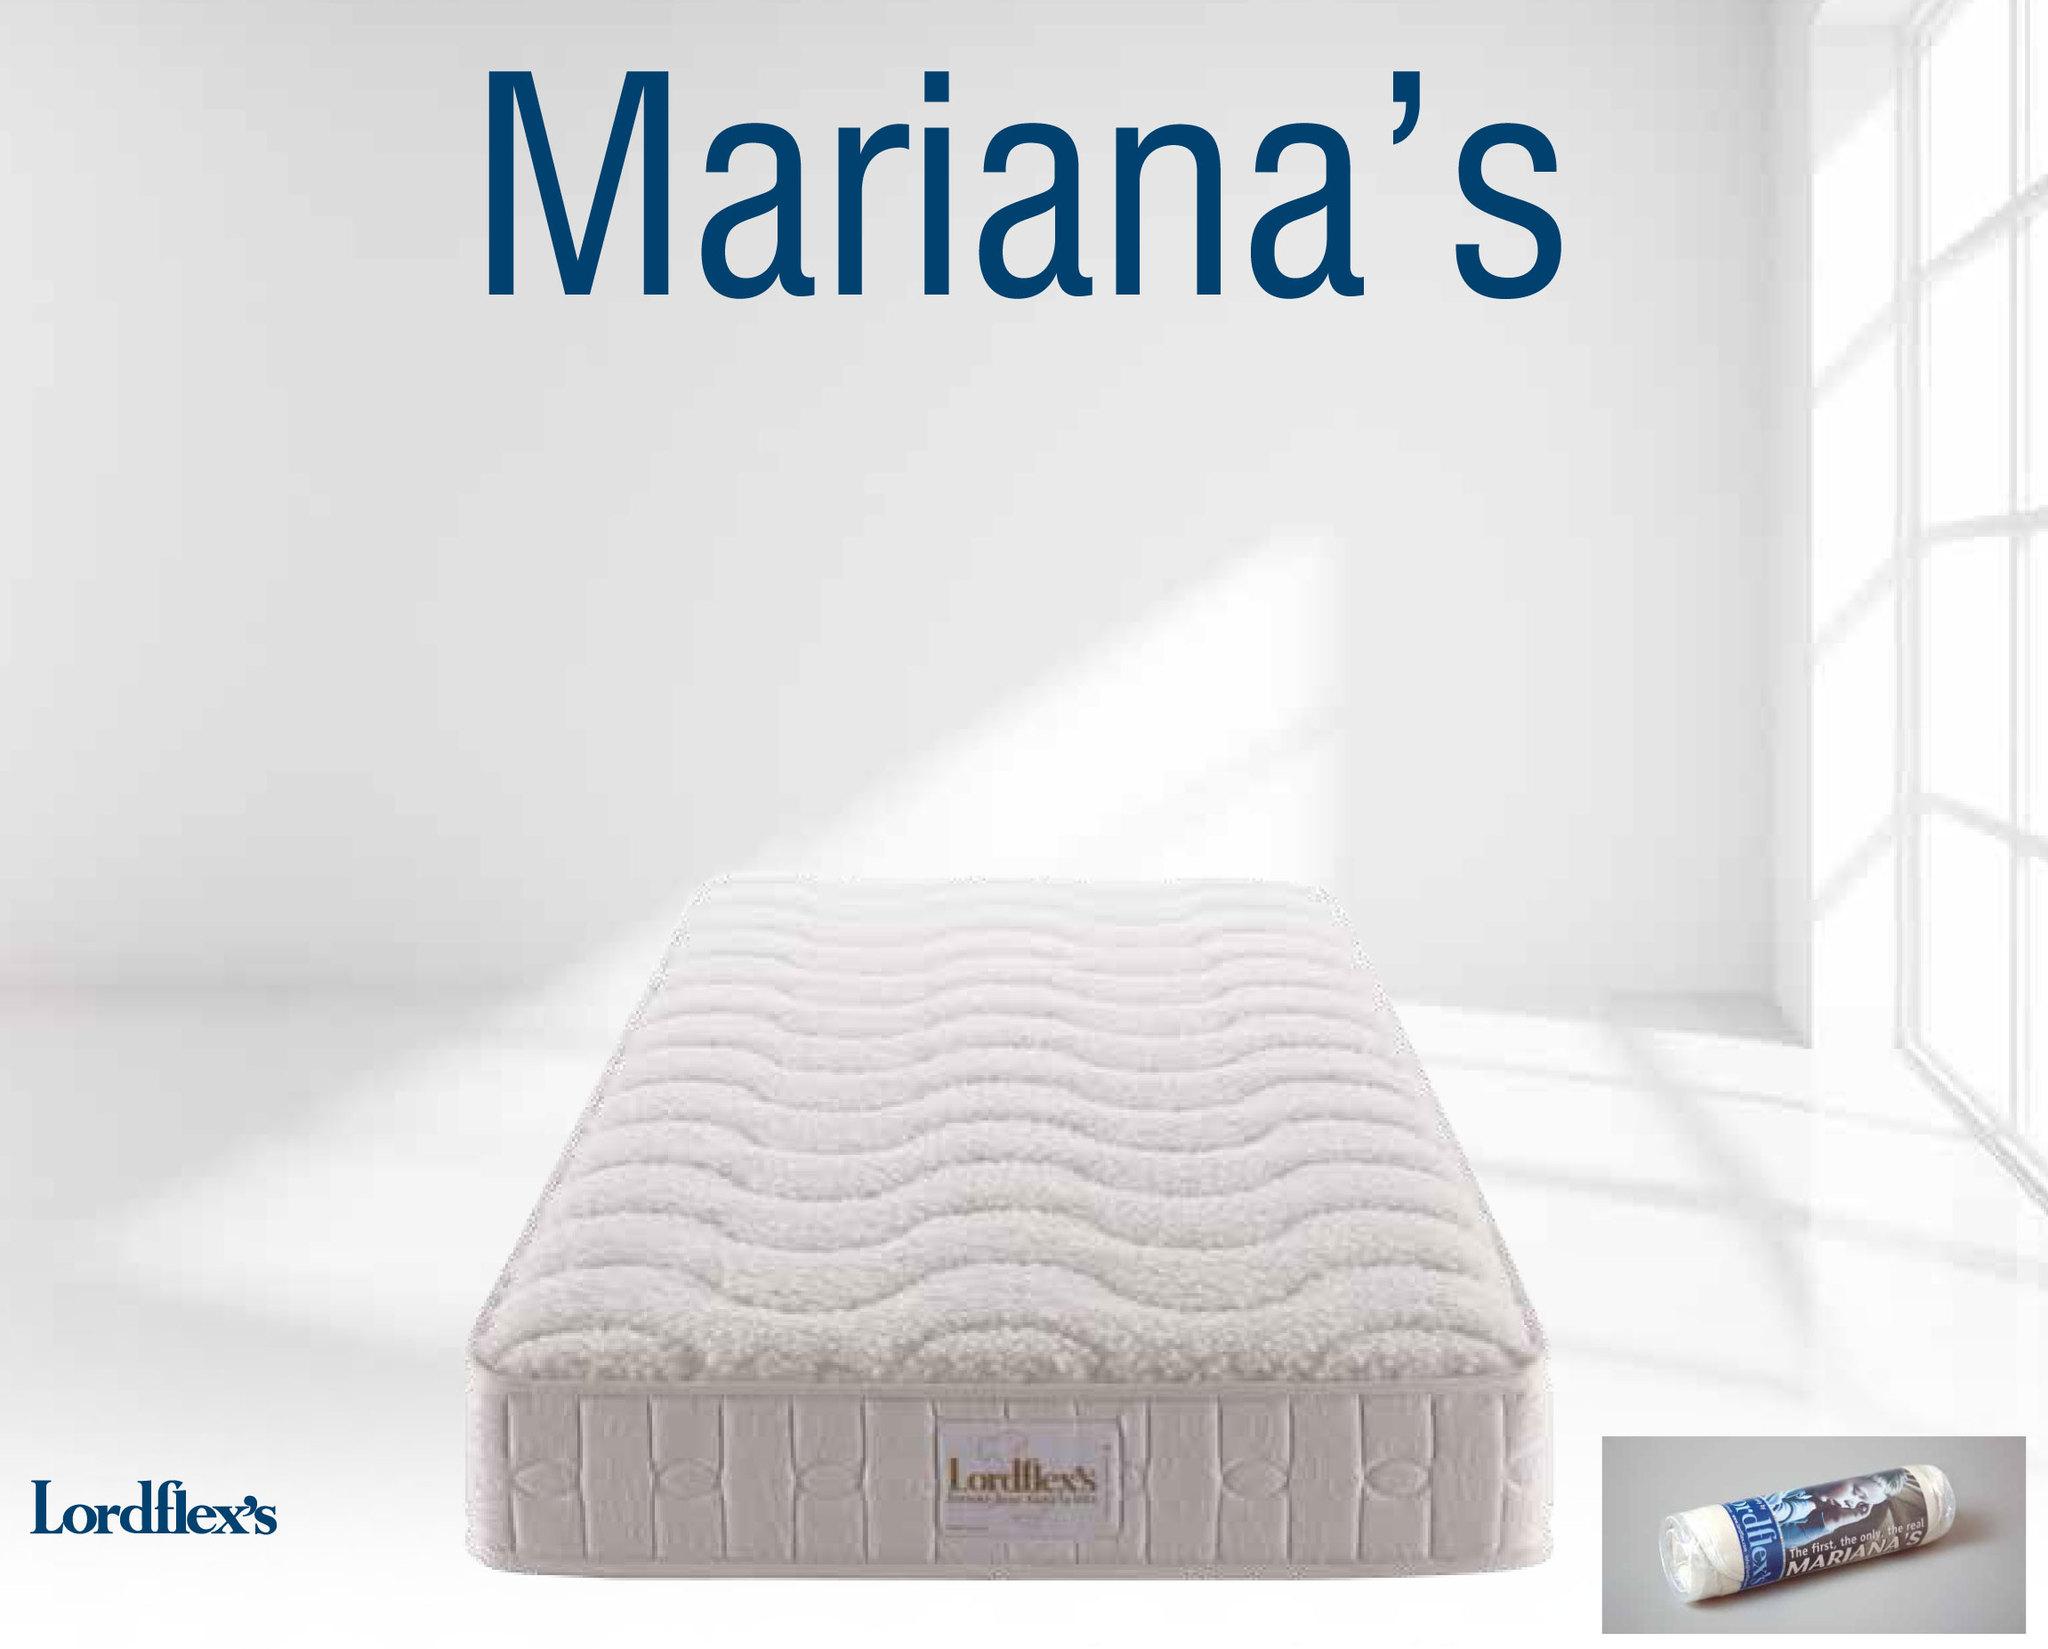 Матрасы Матрас ортопедический Lordflex's Mariana's 140х200 до 140 кг 1_Mariana_s.jpg